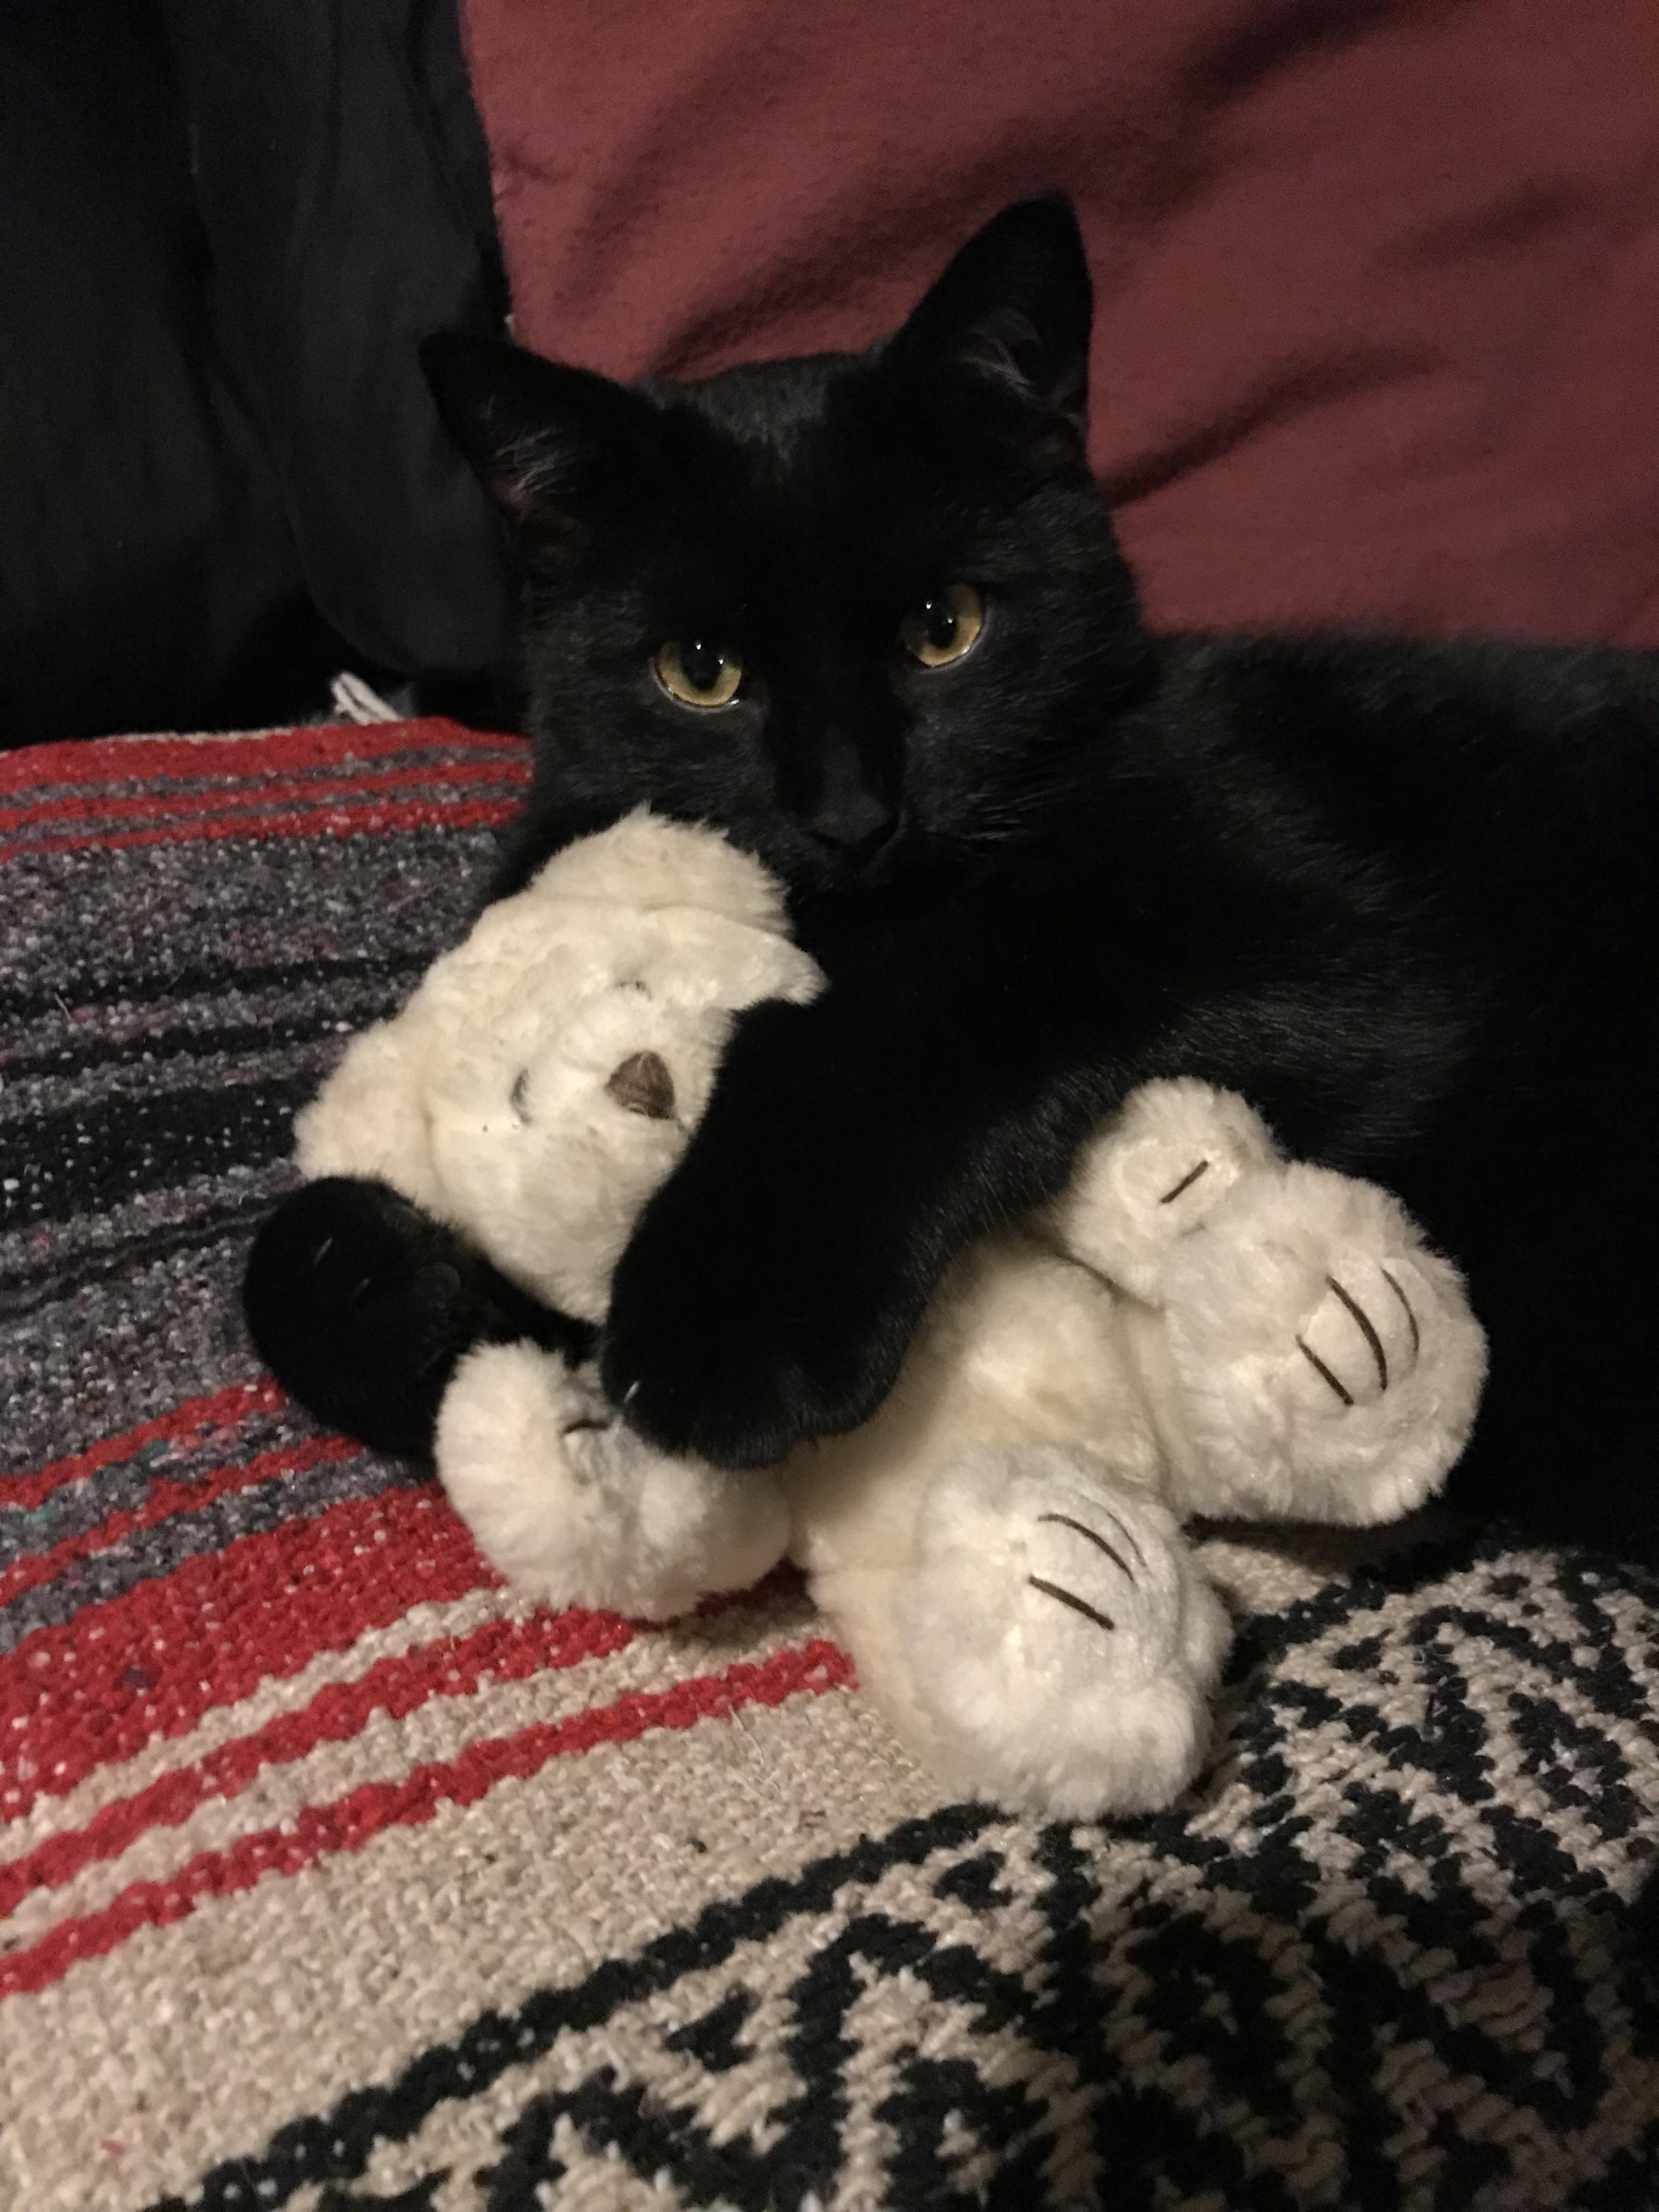 Zero Cuddling A Teddy Bear Http Ift Tt 2kazxbo Teddy Bear Dog Cat Day Cat Lovers